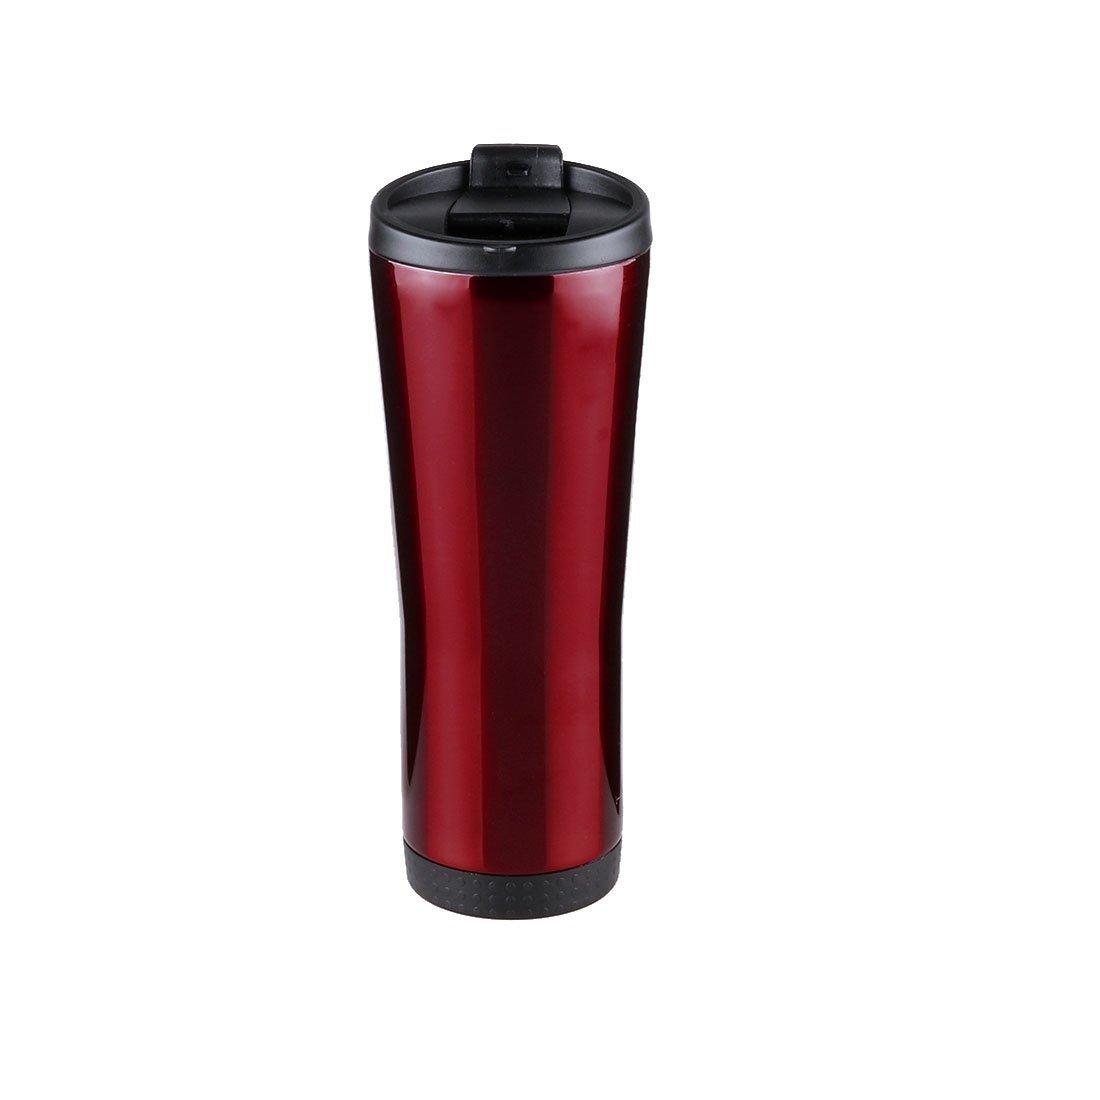 Amazon.com: eDealMax AOBONA vacío autorizado Vaso Térmico 18/8 viaje del acero inoxidable del Ministerio del Interior Taza-Sweat taza de café con tapa, ...